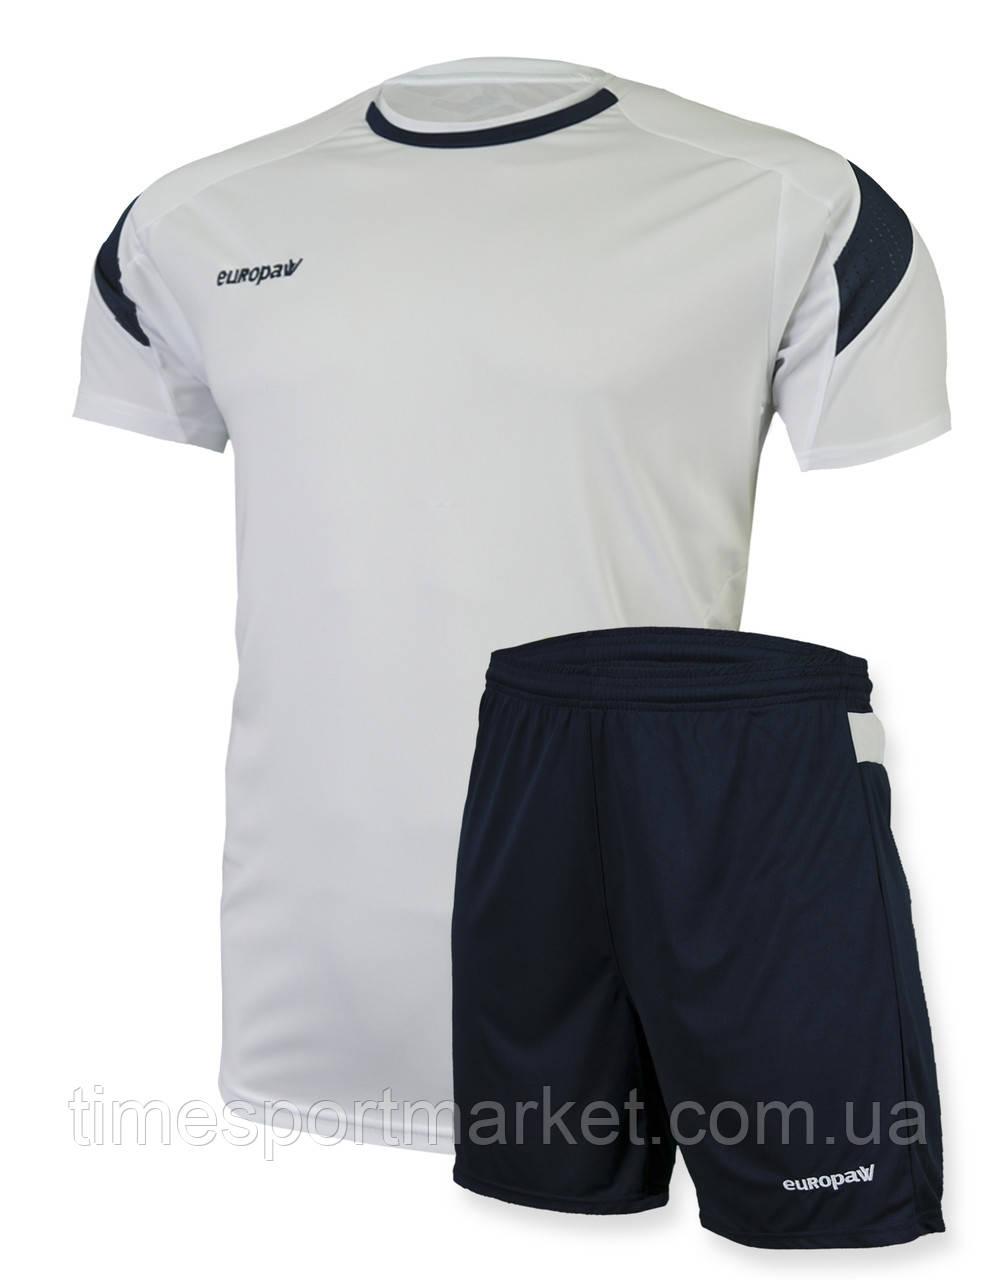 Футбольная форма для команд Europaw 10-01 белая (Реплика)